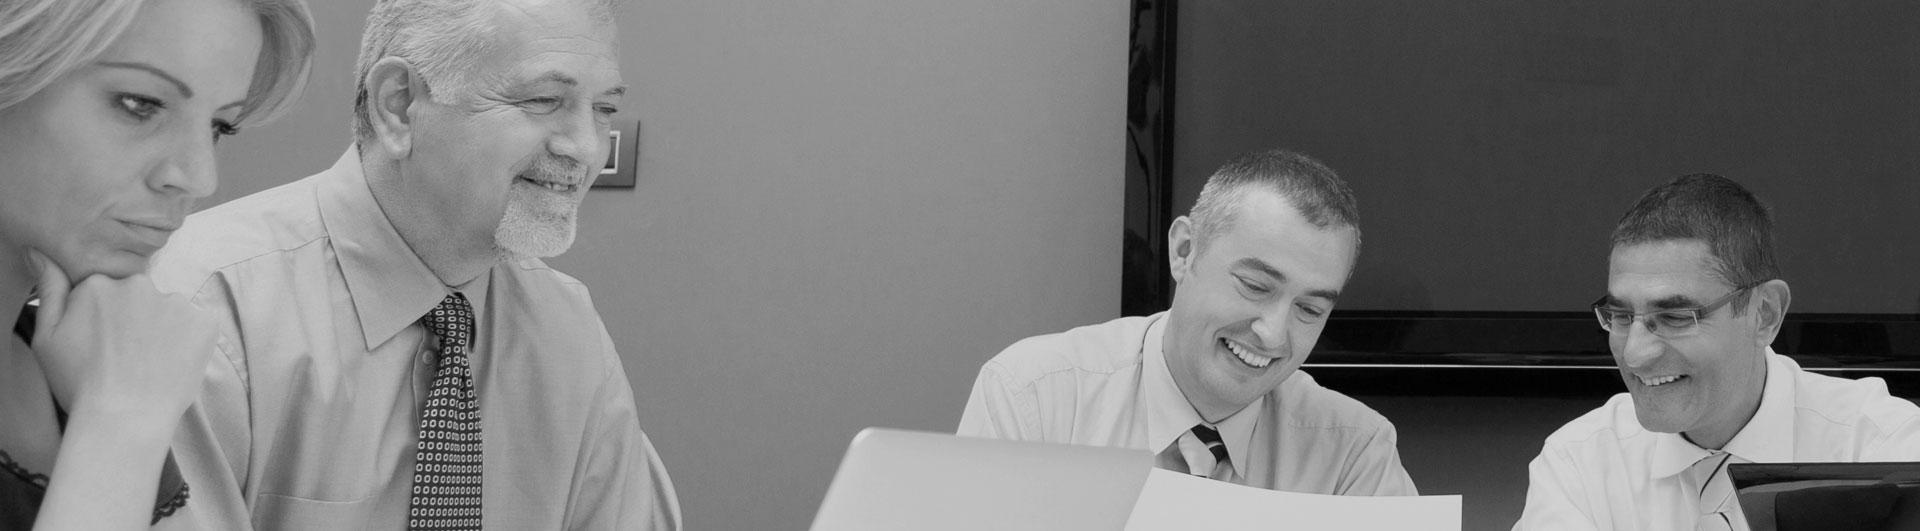 metodologia coaching directivo